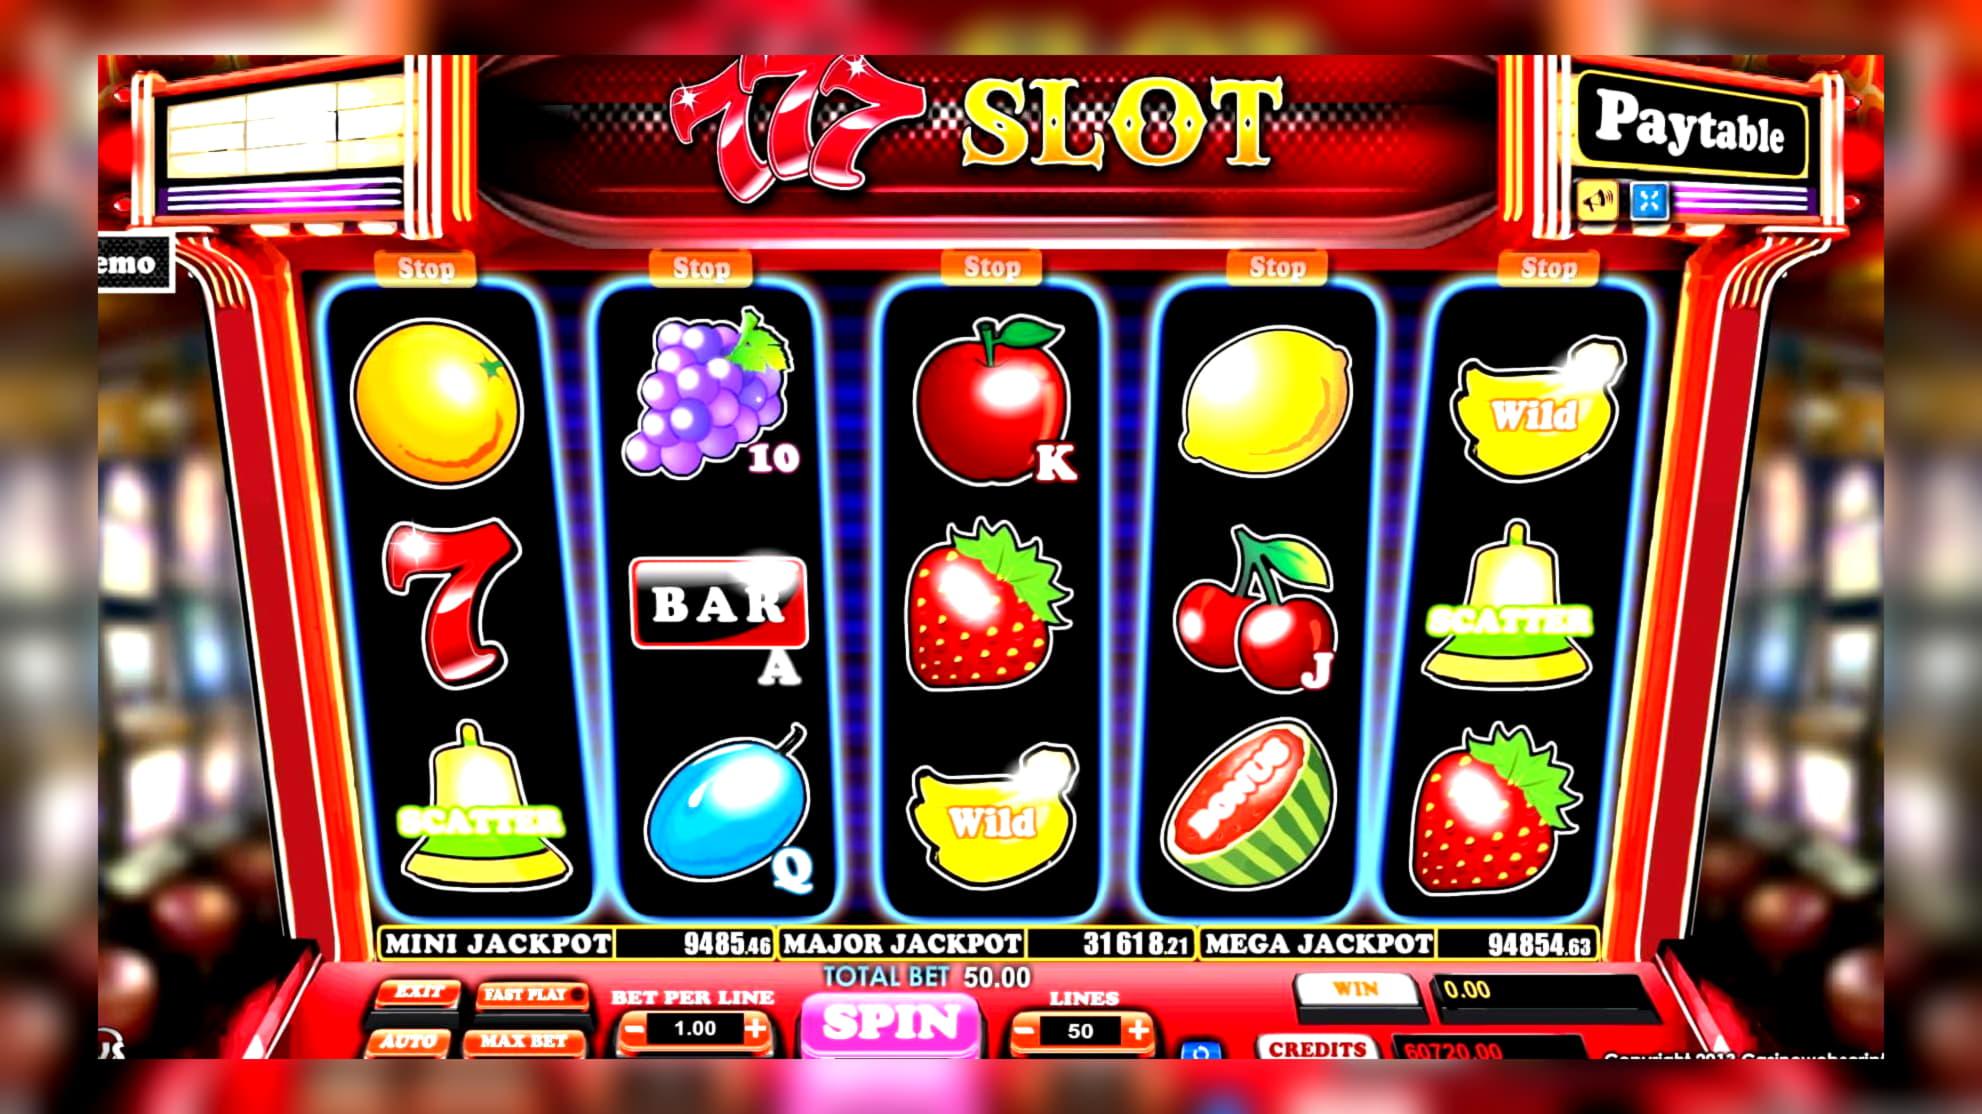 $370 Free Casino Chip at Vegas Crest Casino